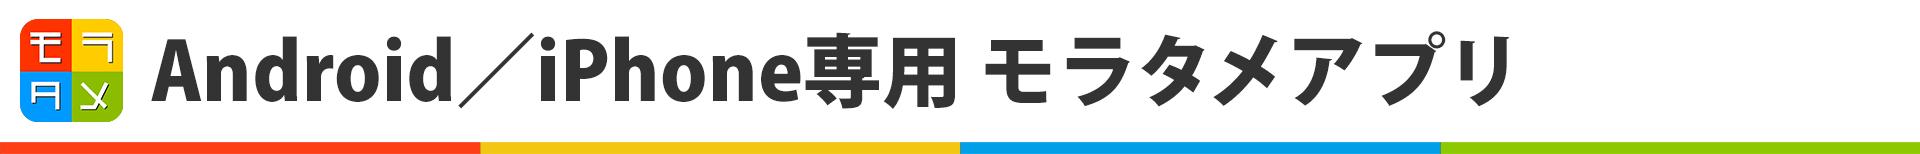 Android/iPhone専用 モラタメアプリ